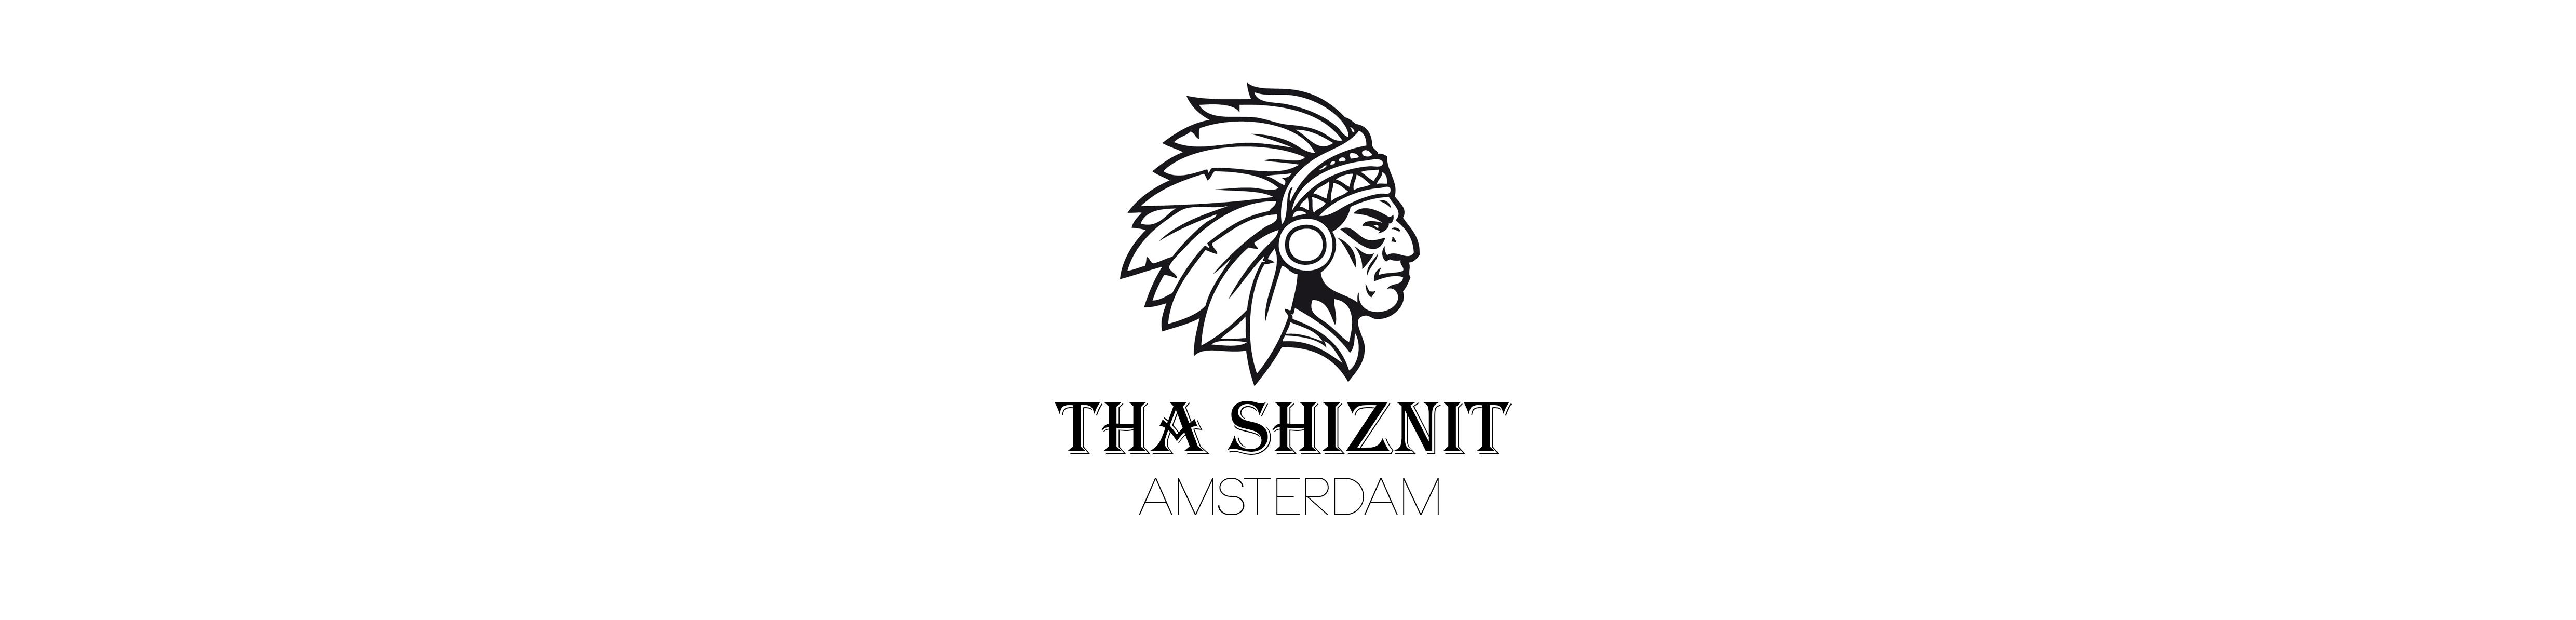 THA SHIZNIT